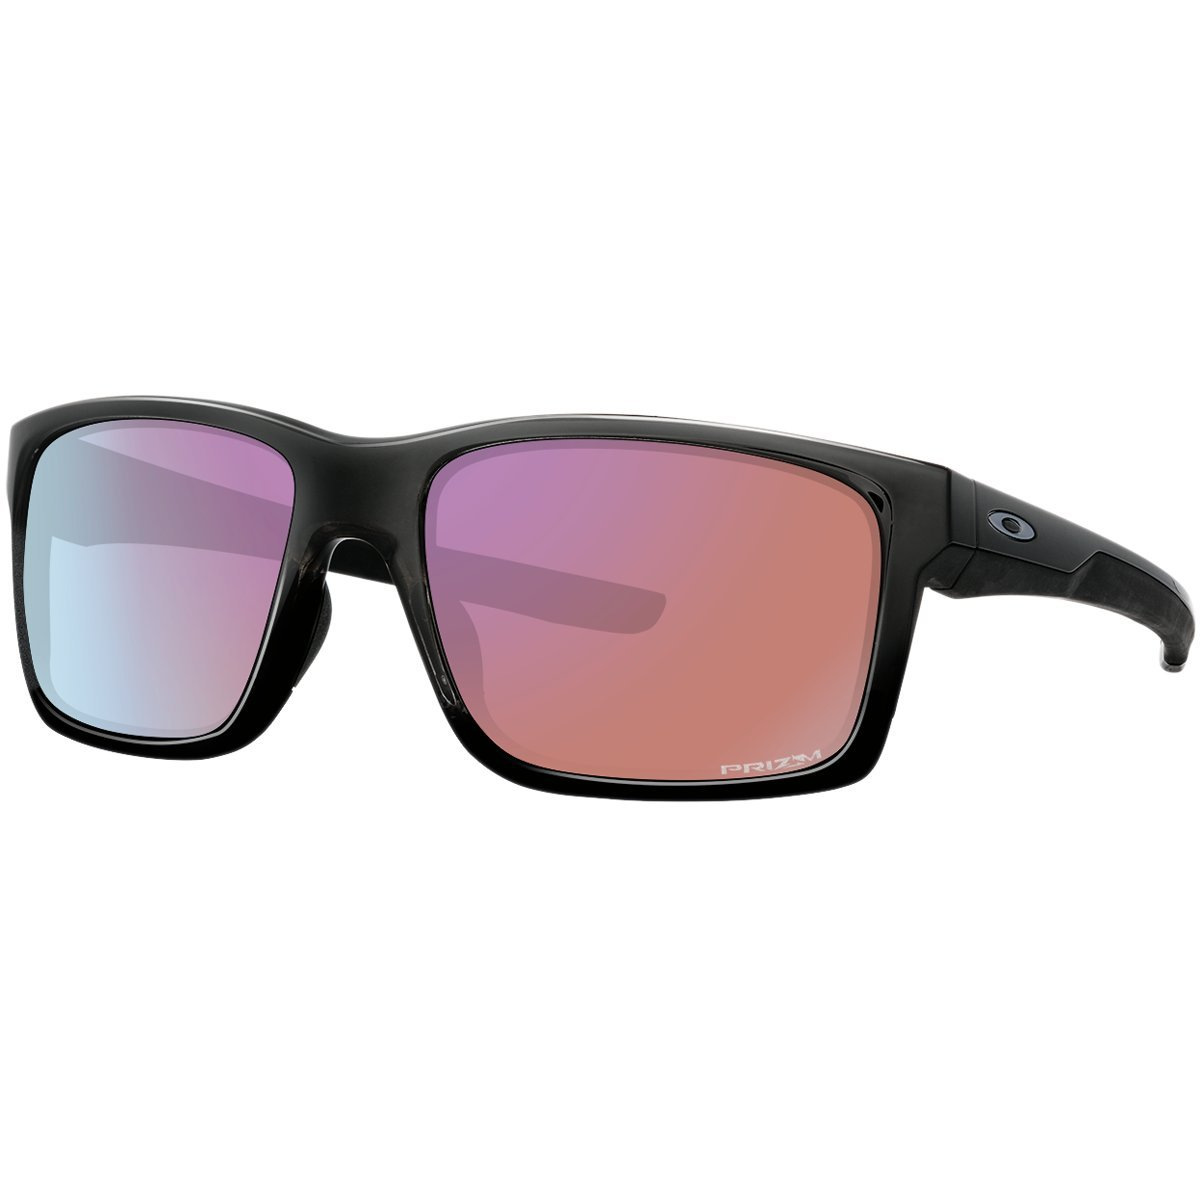 Oakley Men's Mainlink Non-Polarized Iridium Rectangular Sunglasses, Polished Black w/Prizm Golf, 57 mm by Oakley